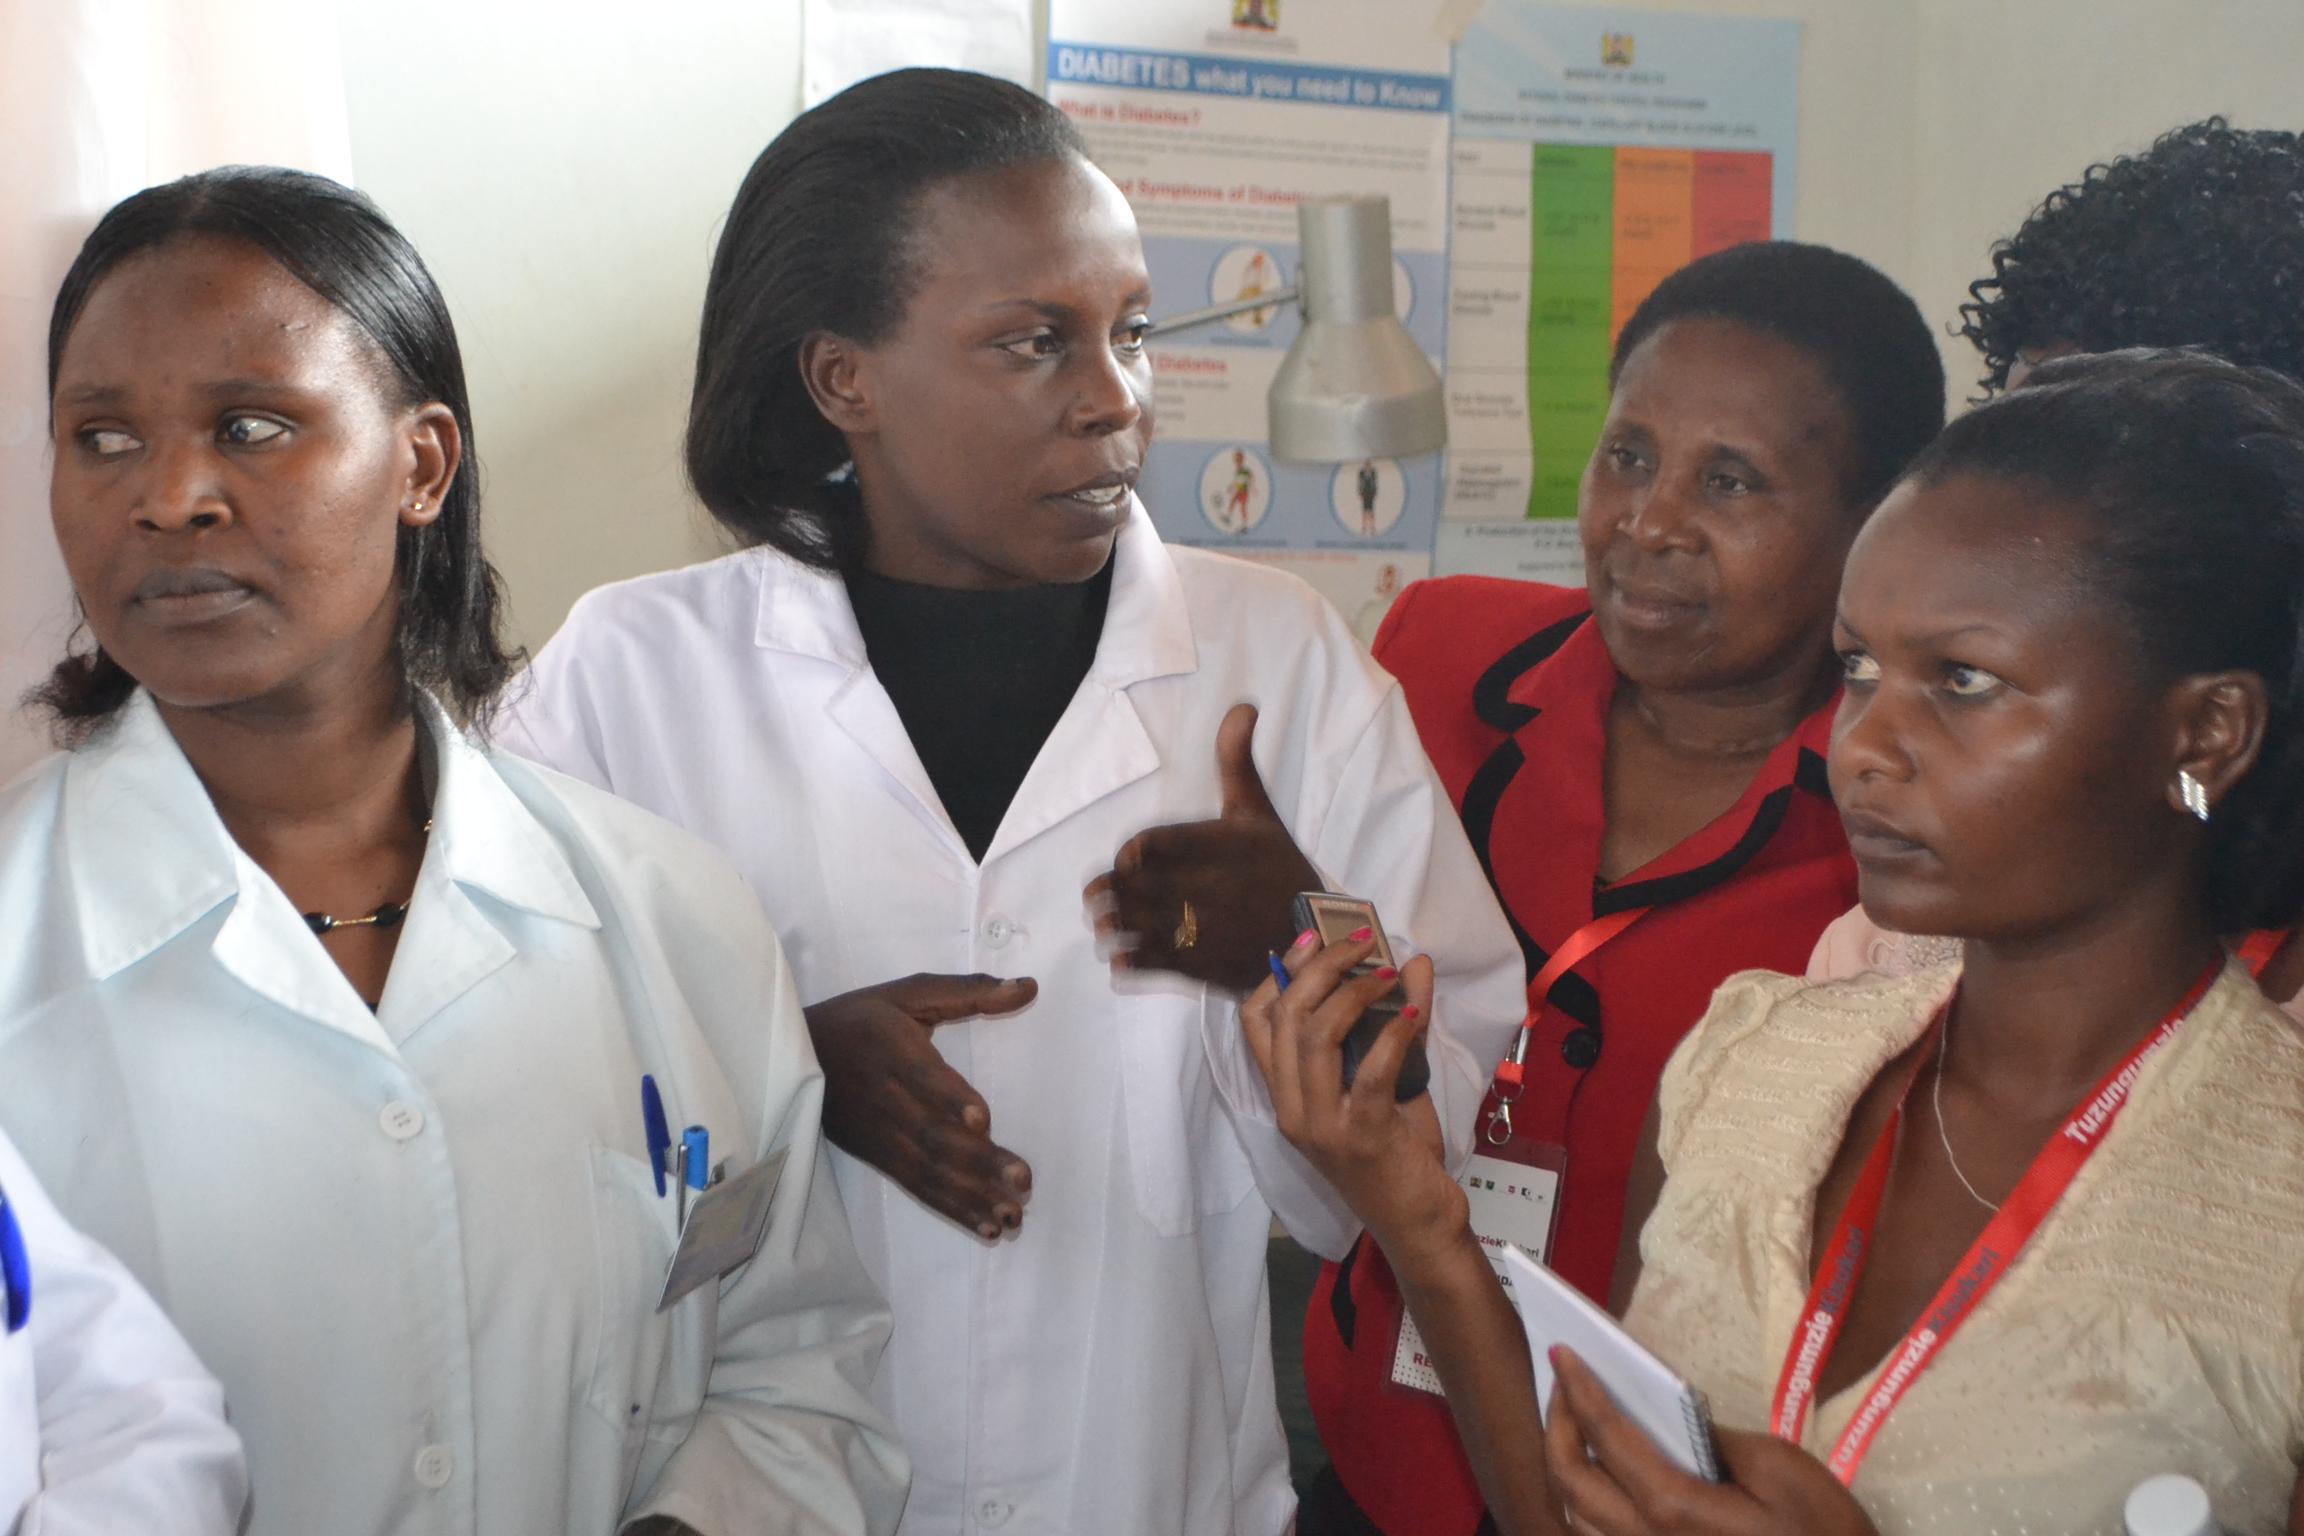 Field Trip to Rift Valley Provincial Hospital, Nakuru